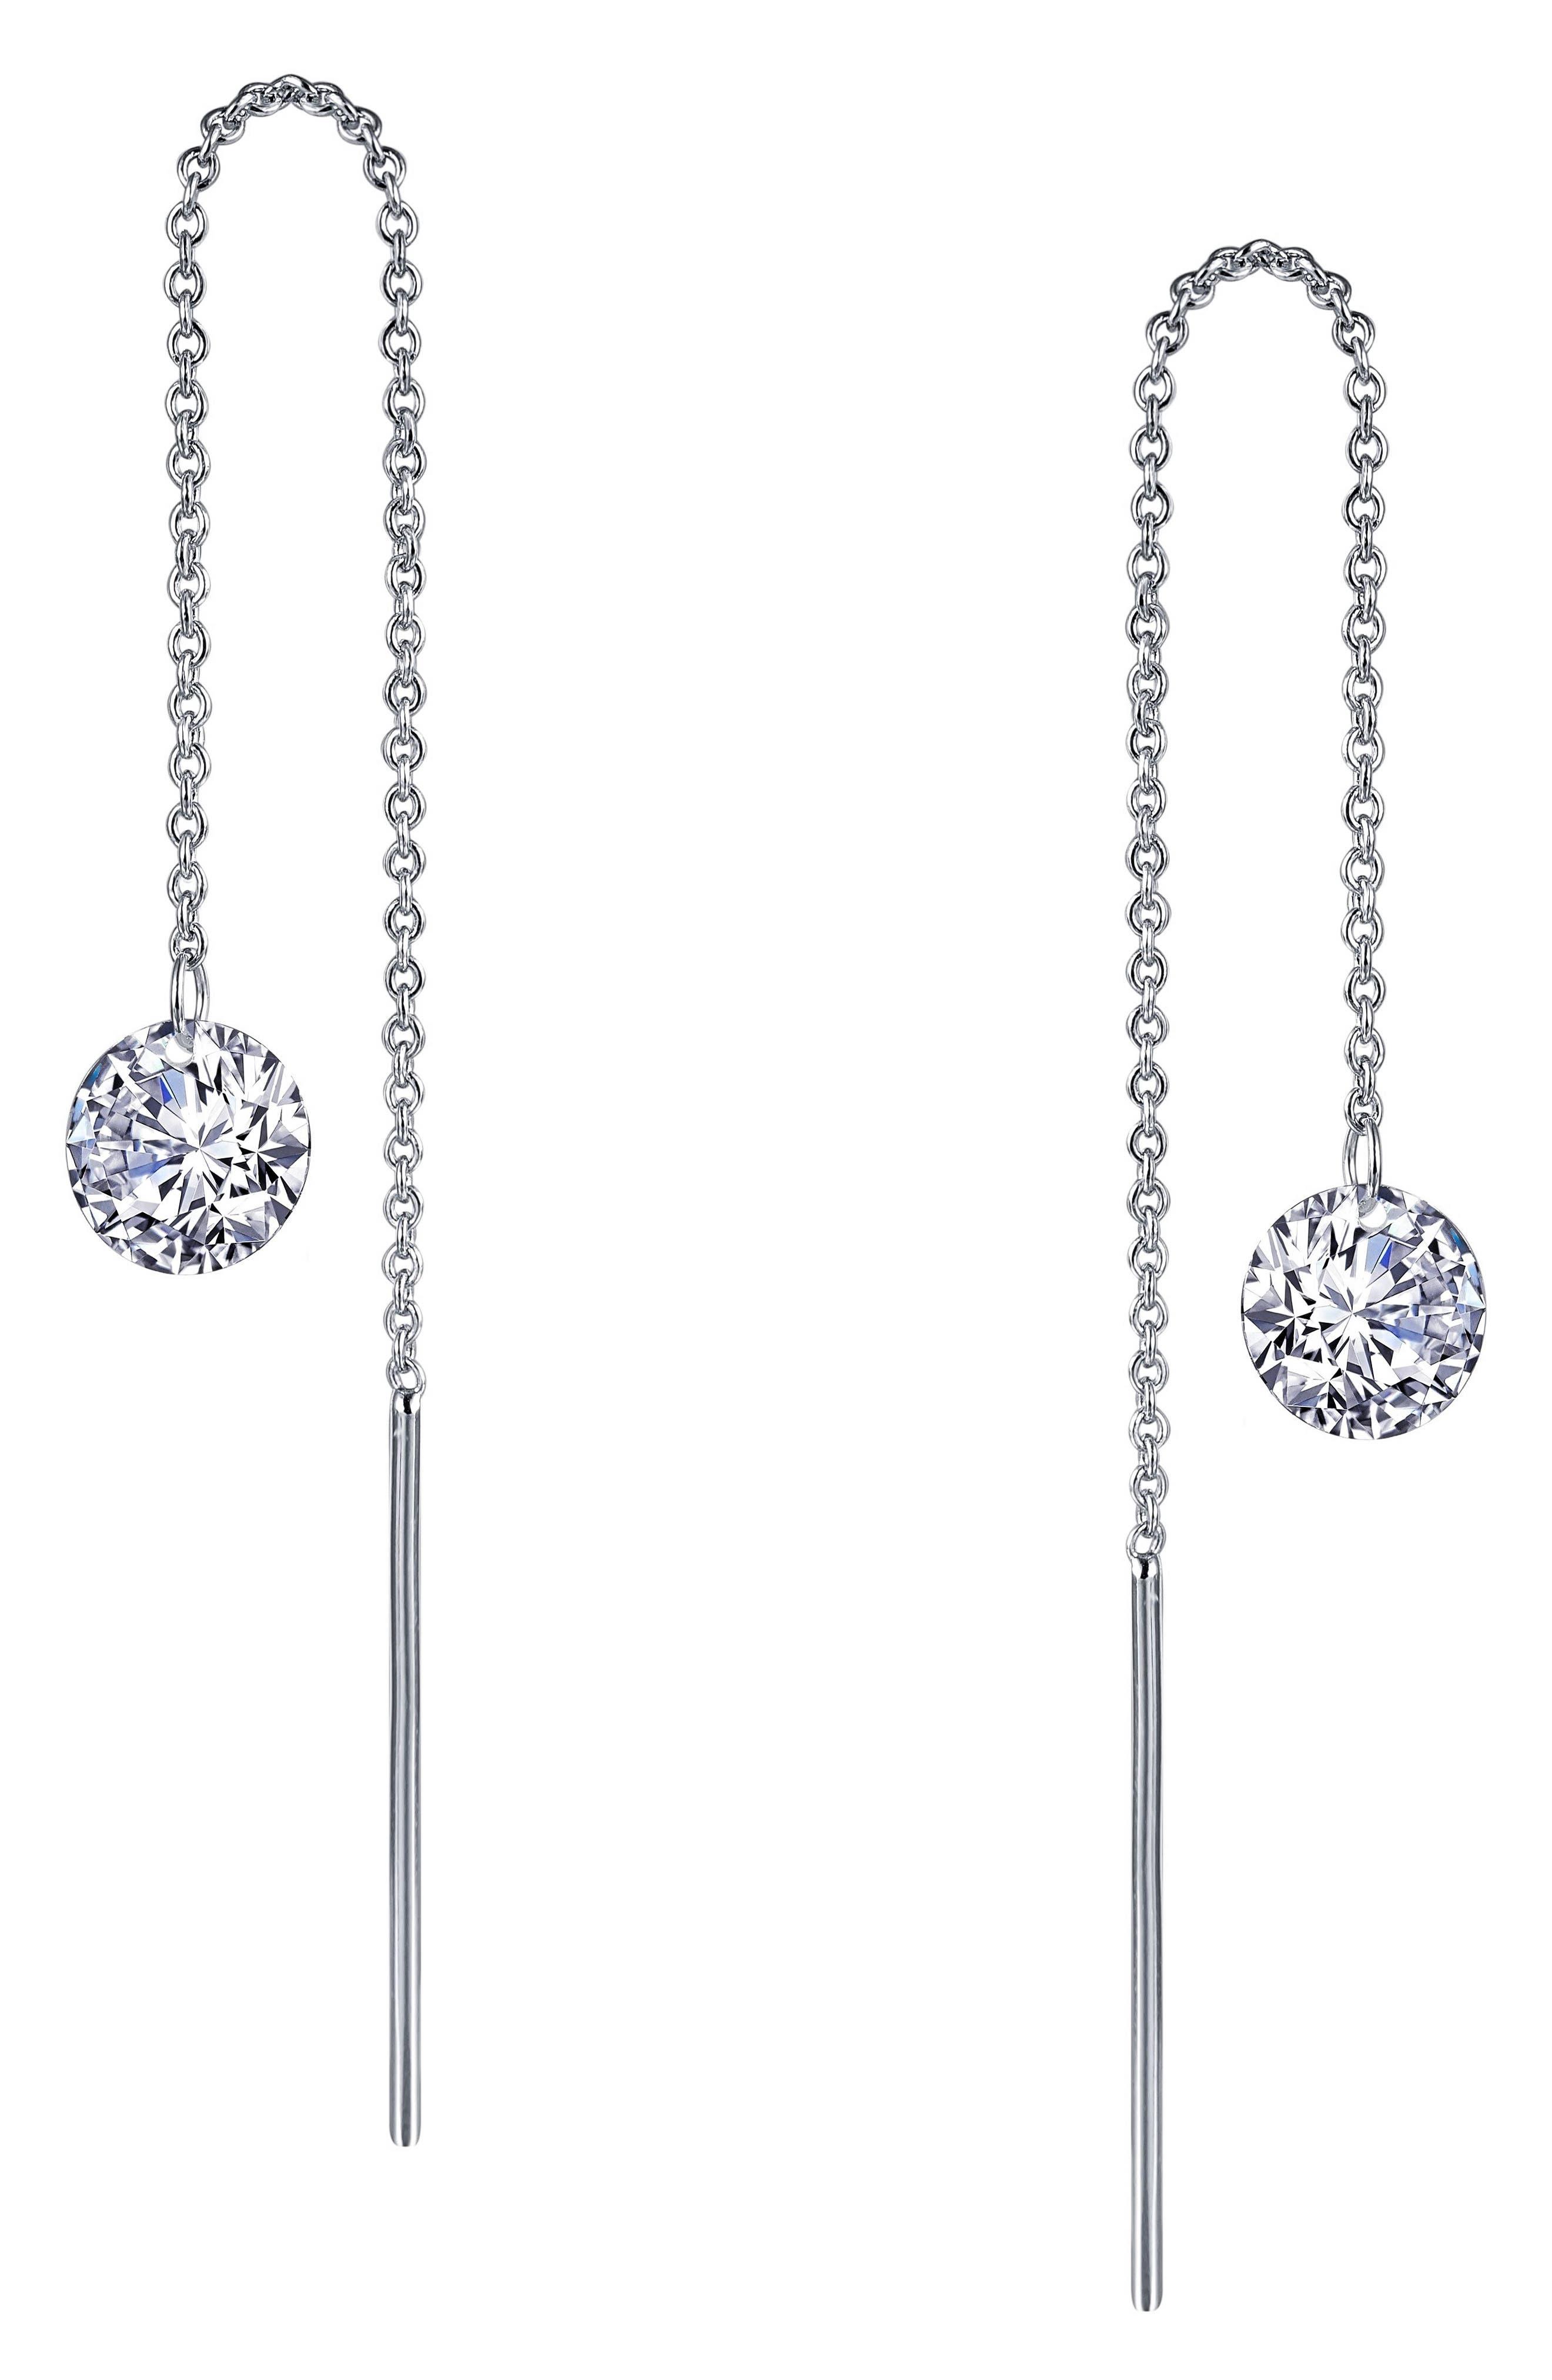 Simulated Diamond Threader Earrings,                             Main thumbnail 1, color,                             SILVER